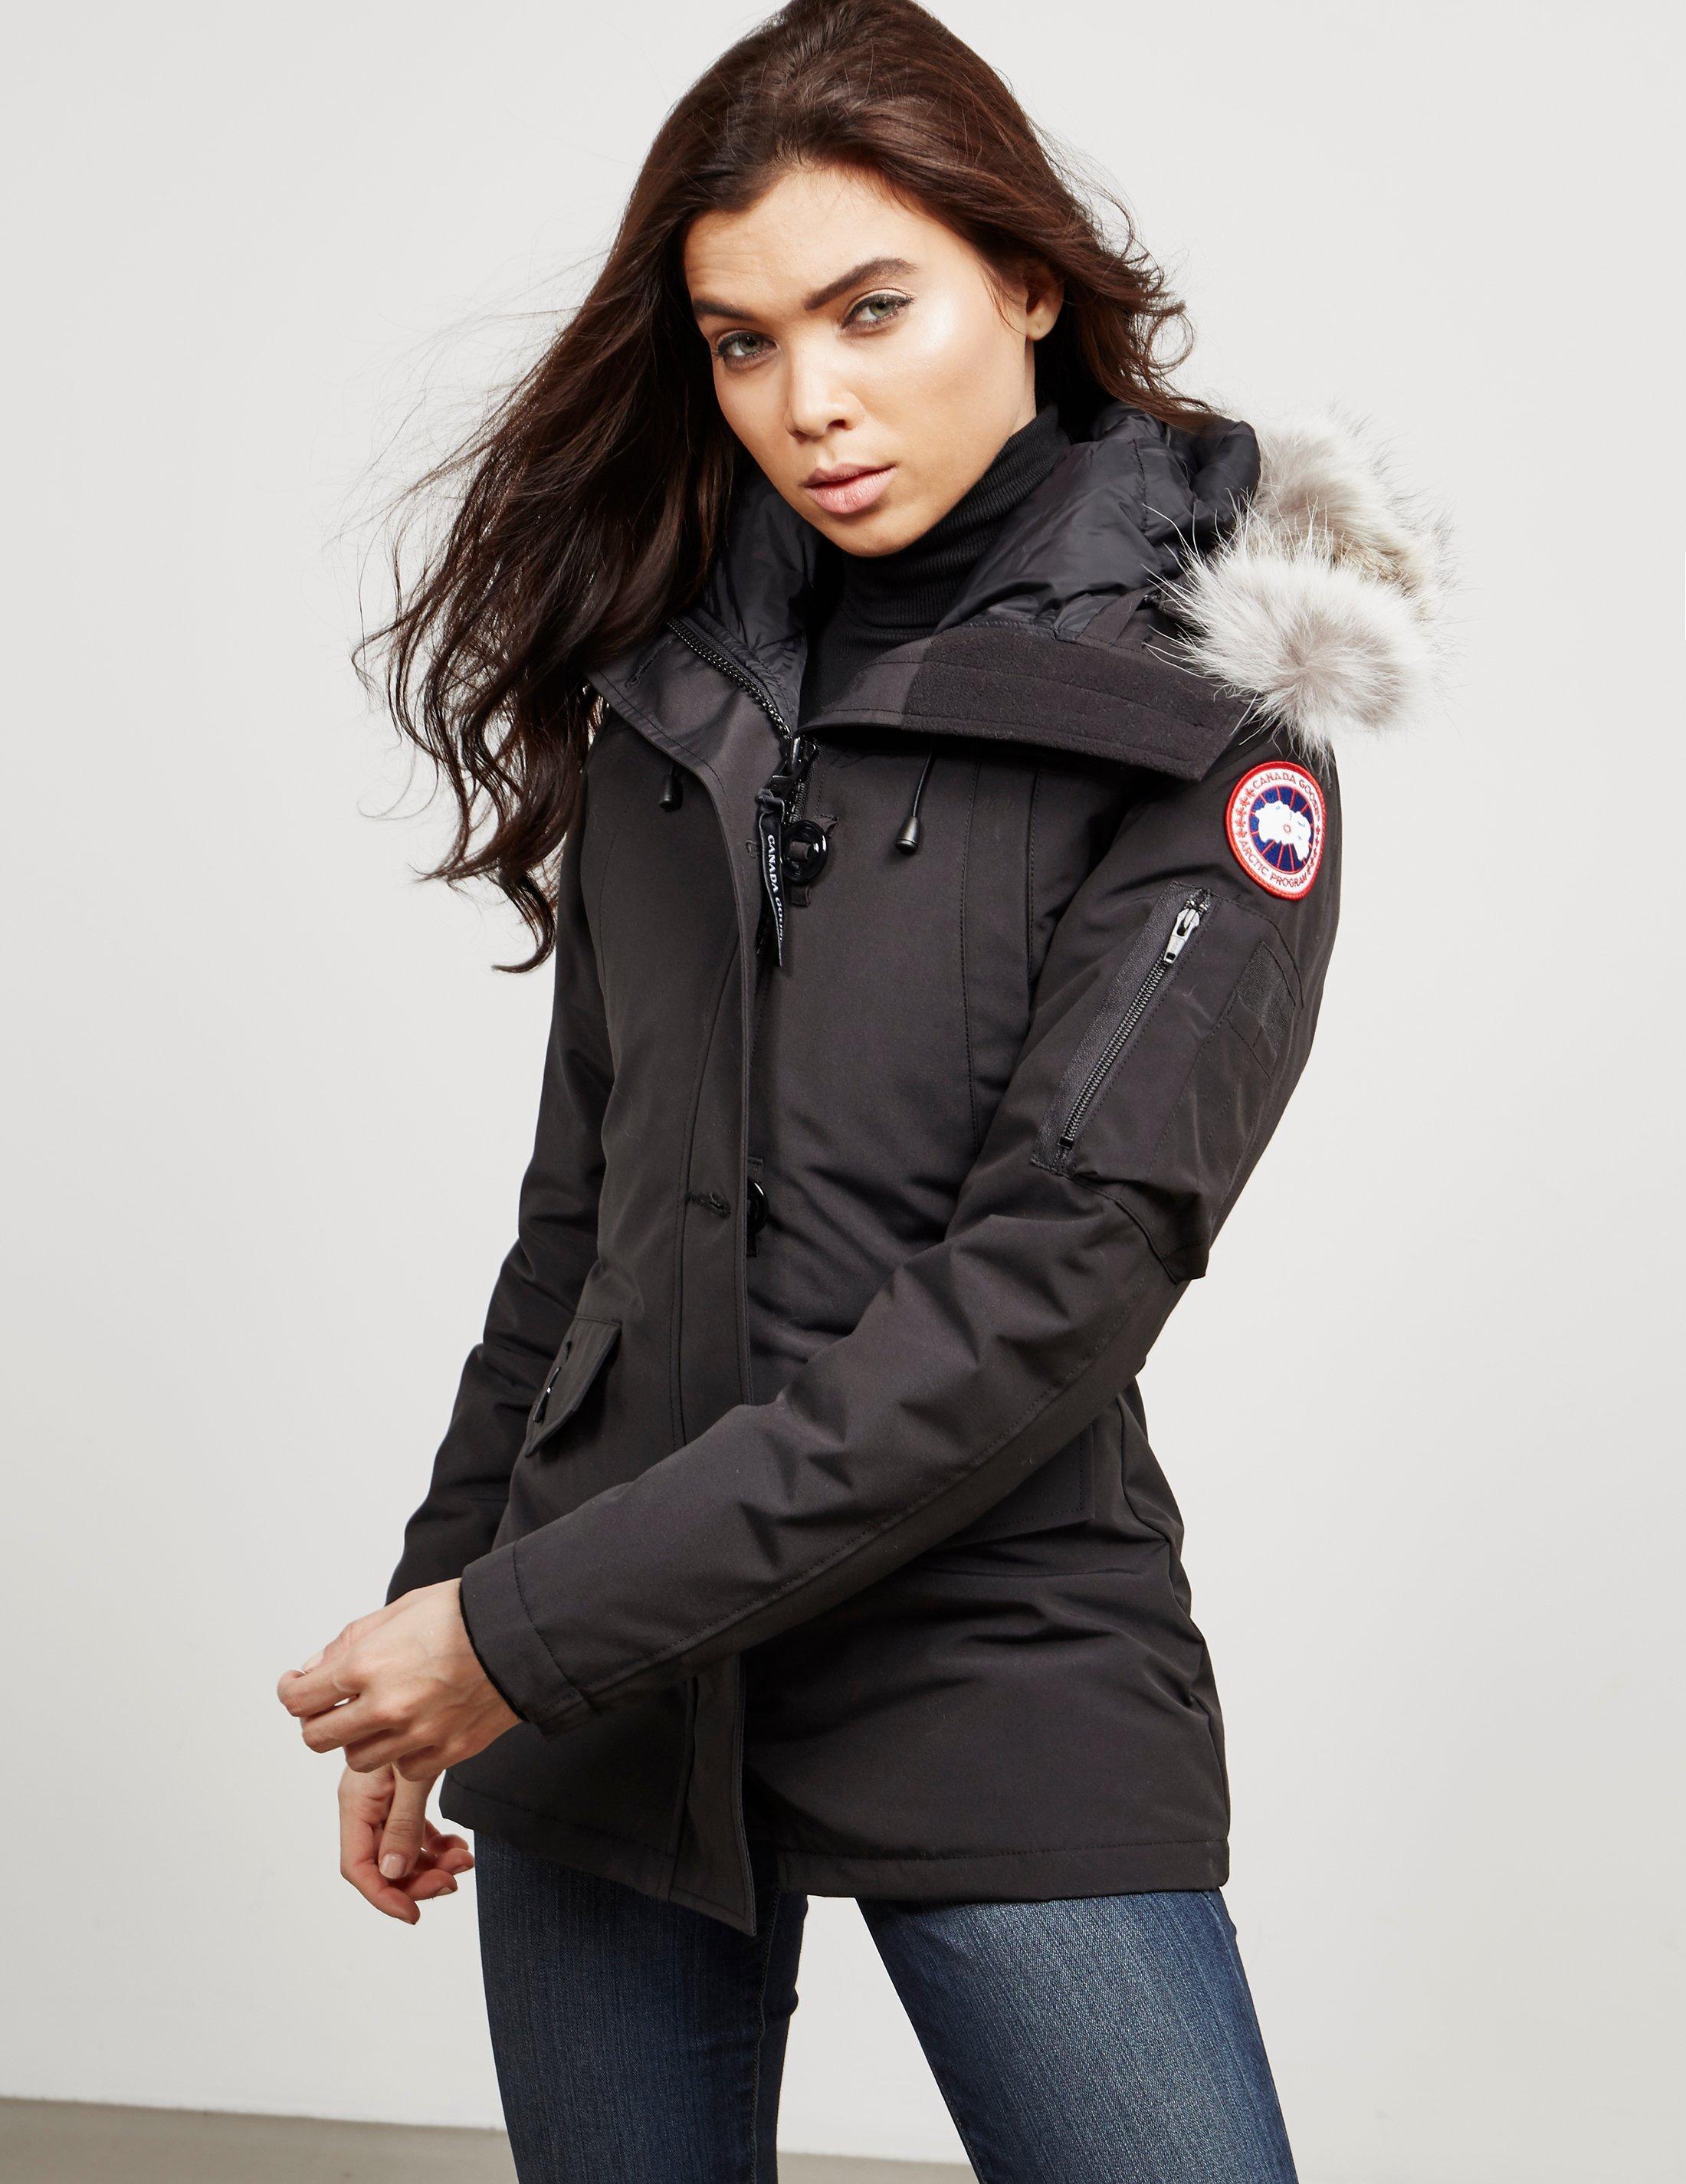 Canada Goose Montebello Parka Jacket in Black - Lyst b3ad47a9b4